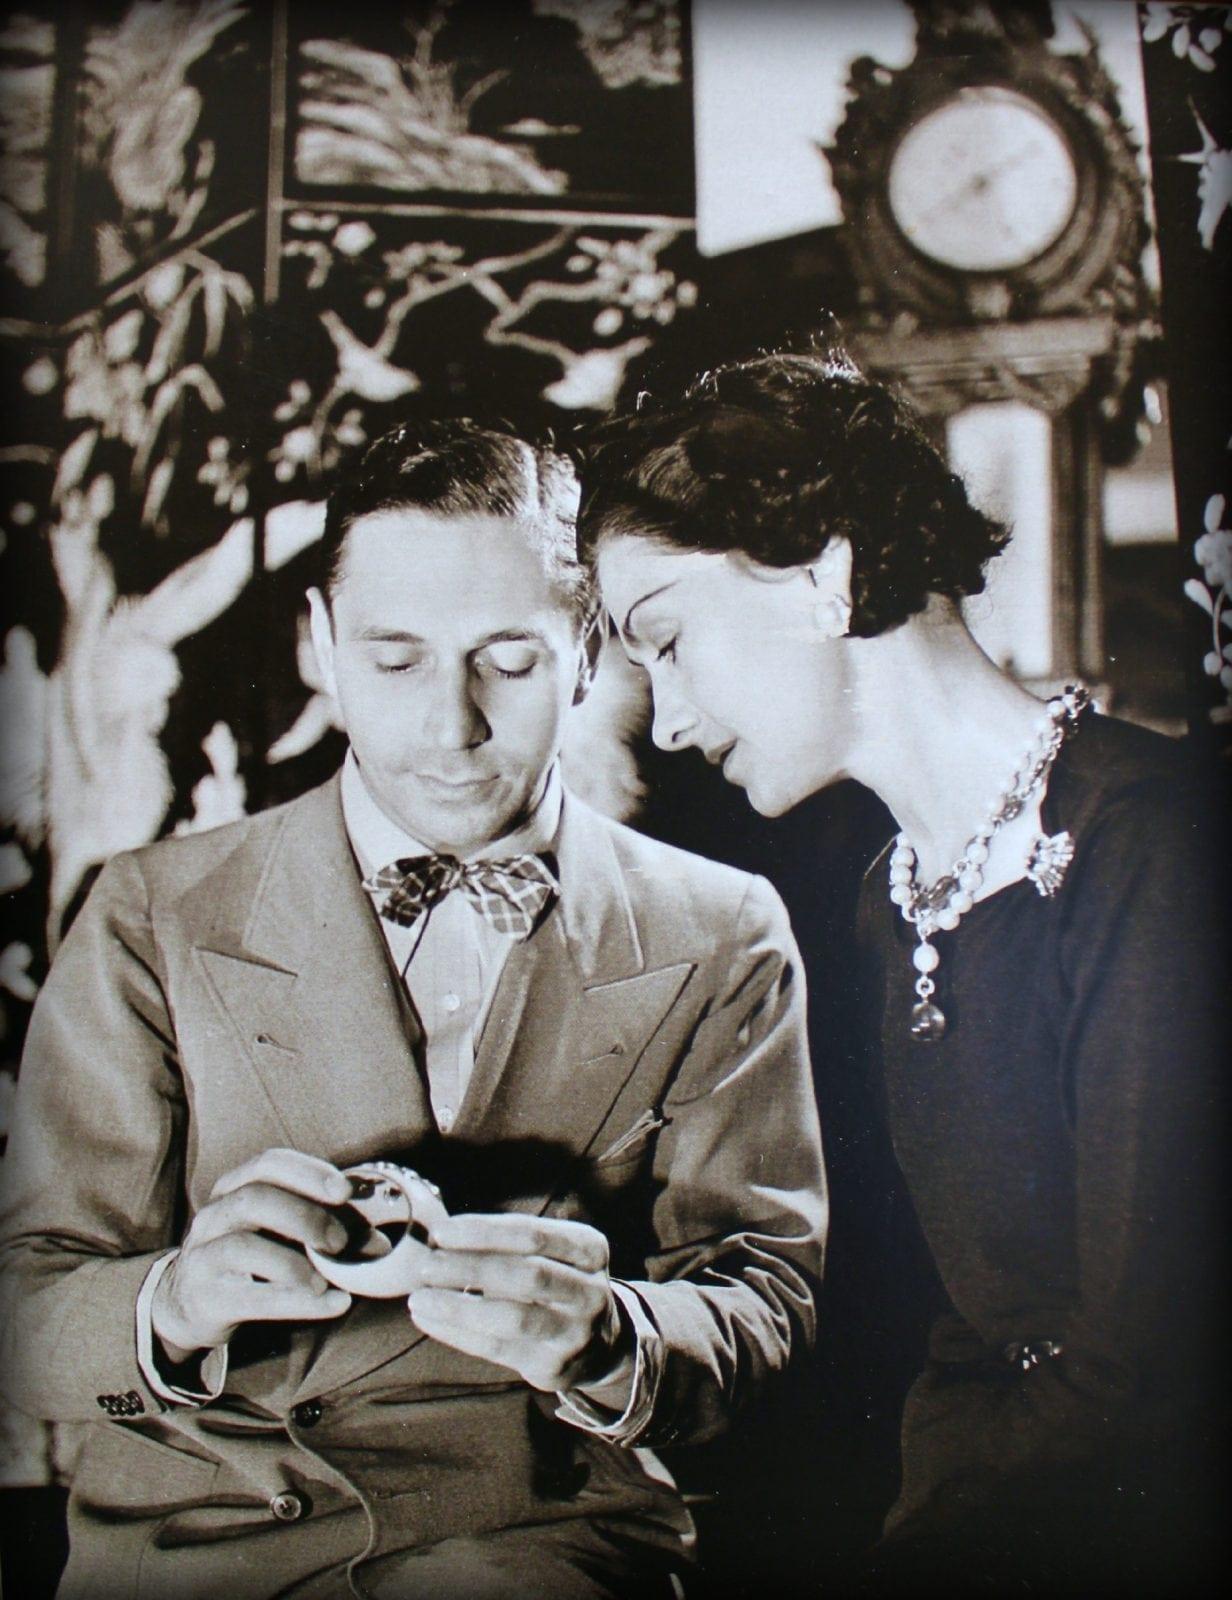 Coco Chanel jeweler Verdura - Fulco di Verdura – destinul unui artist cu o viziune unică